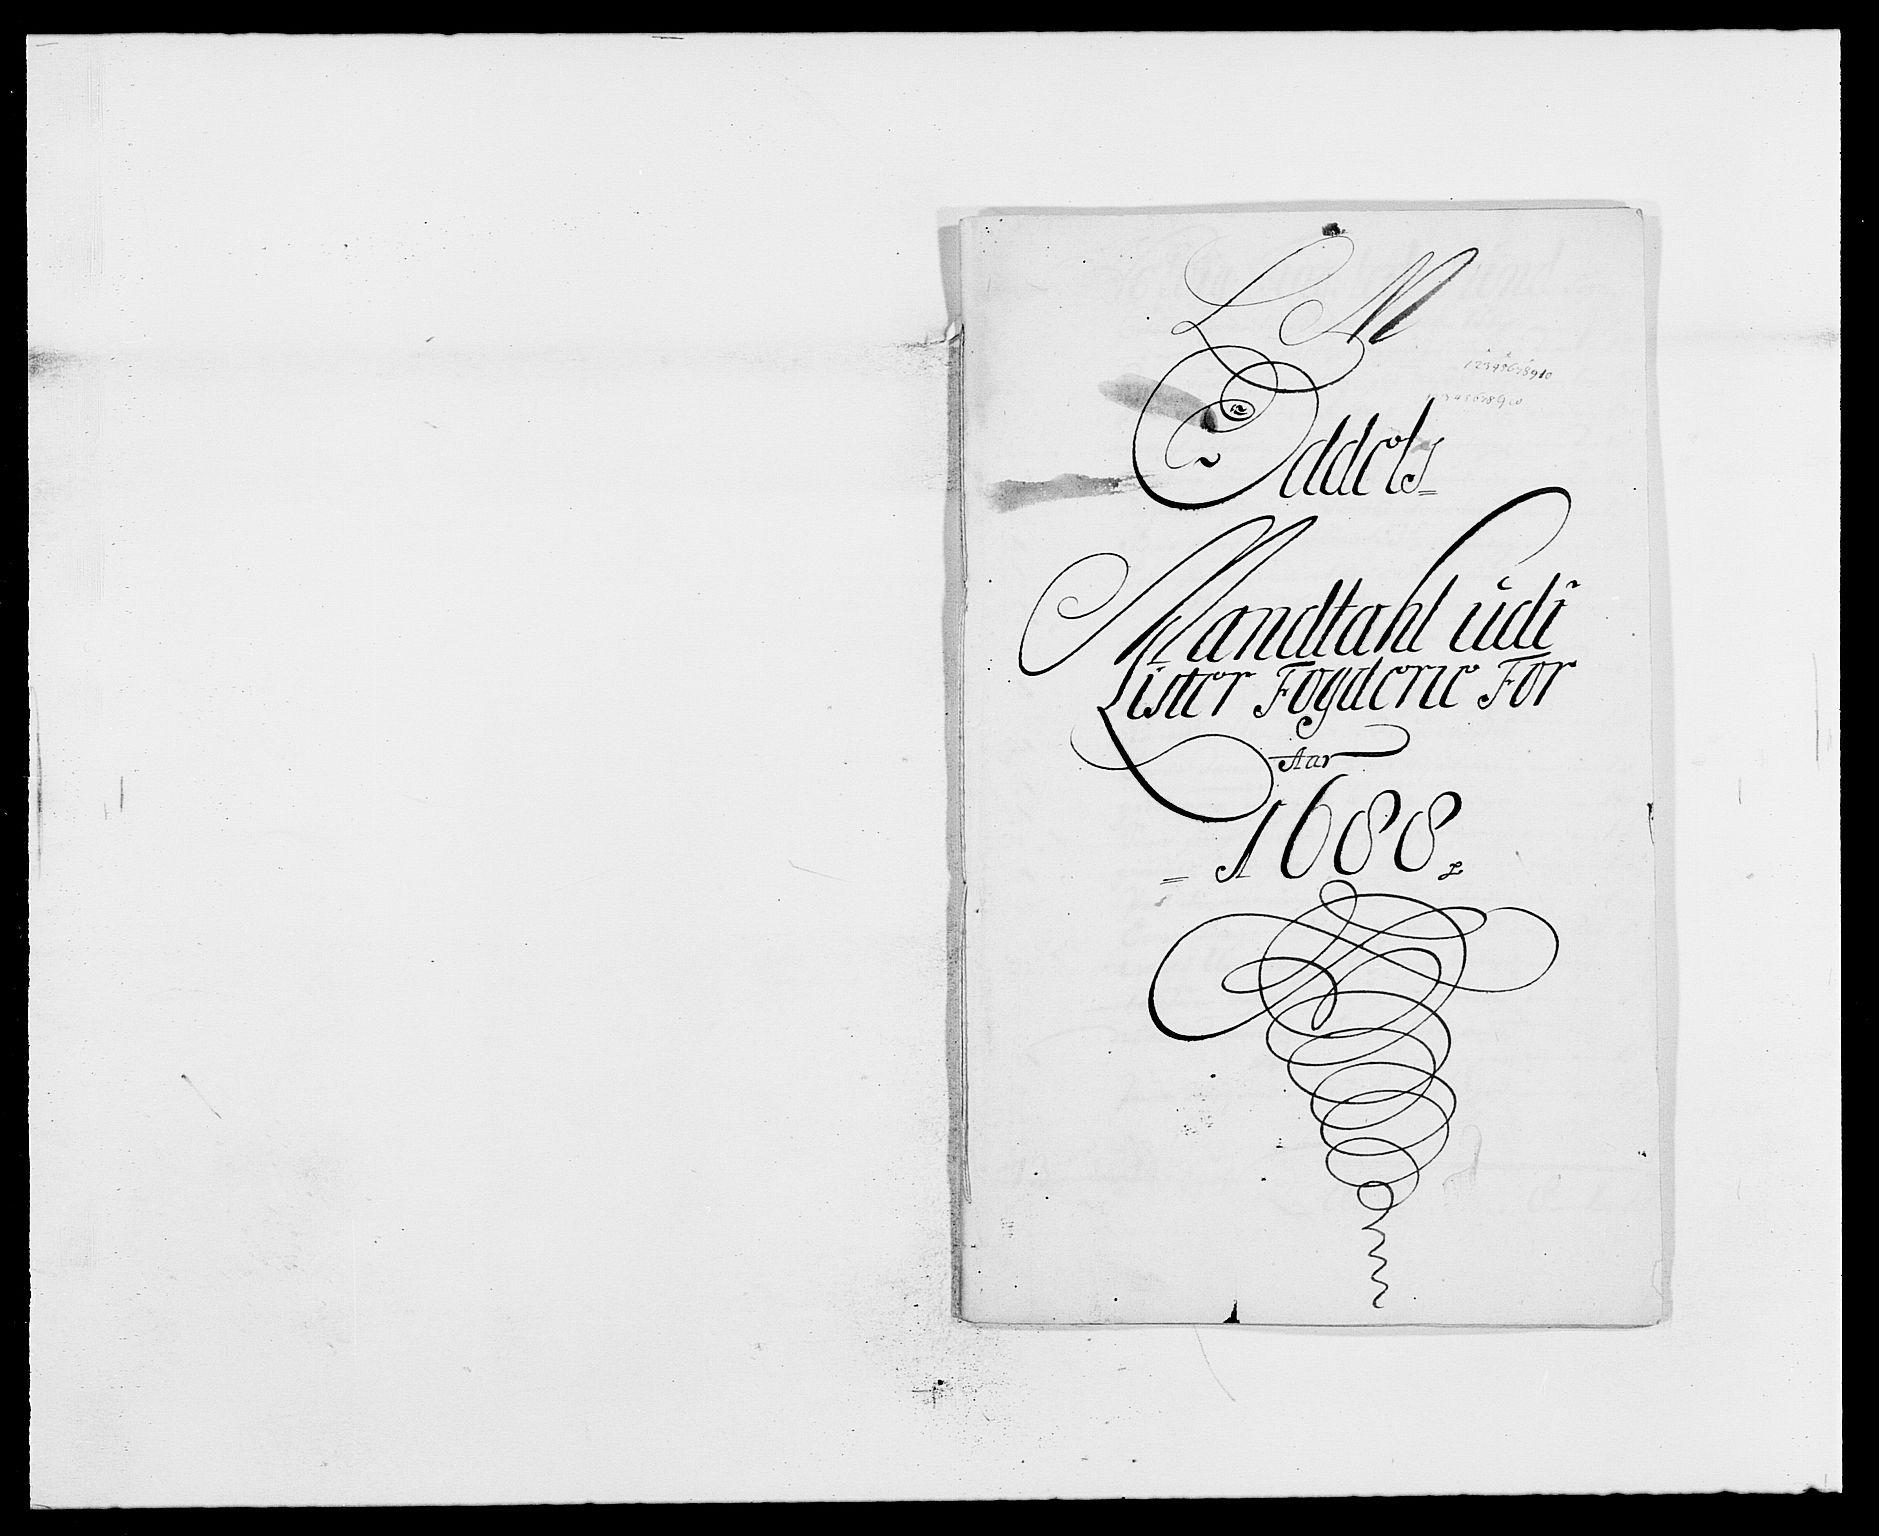 RA, Rentekammeret inntil 1814, Reviderte regnskaper, Fogderegnskap, R41/L2534: Fogderegnskap Lista, 1686-1688, s. 199